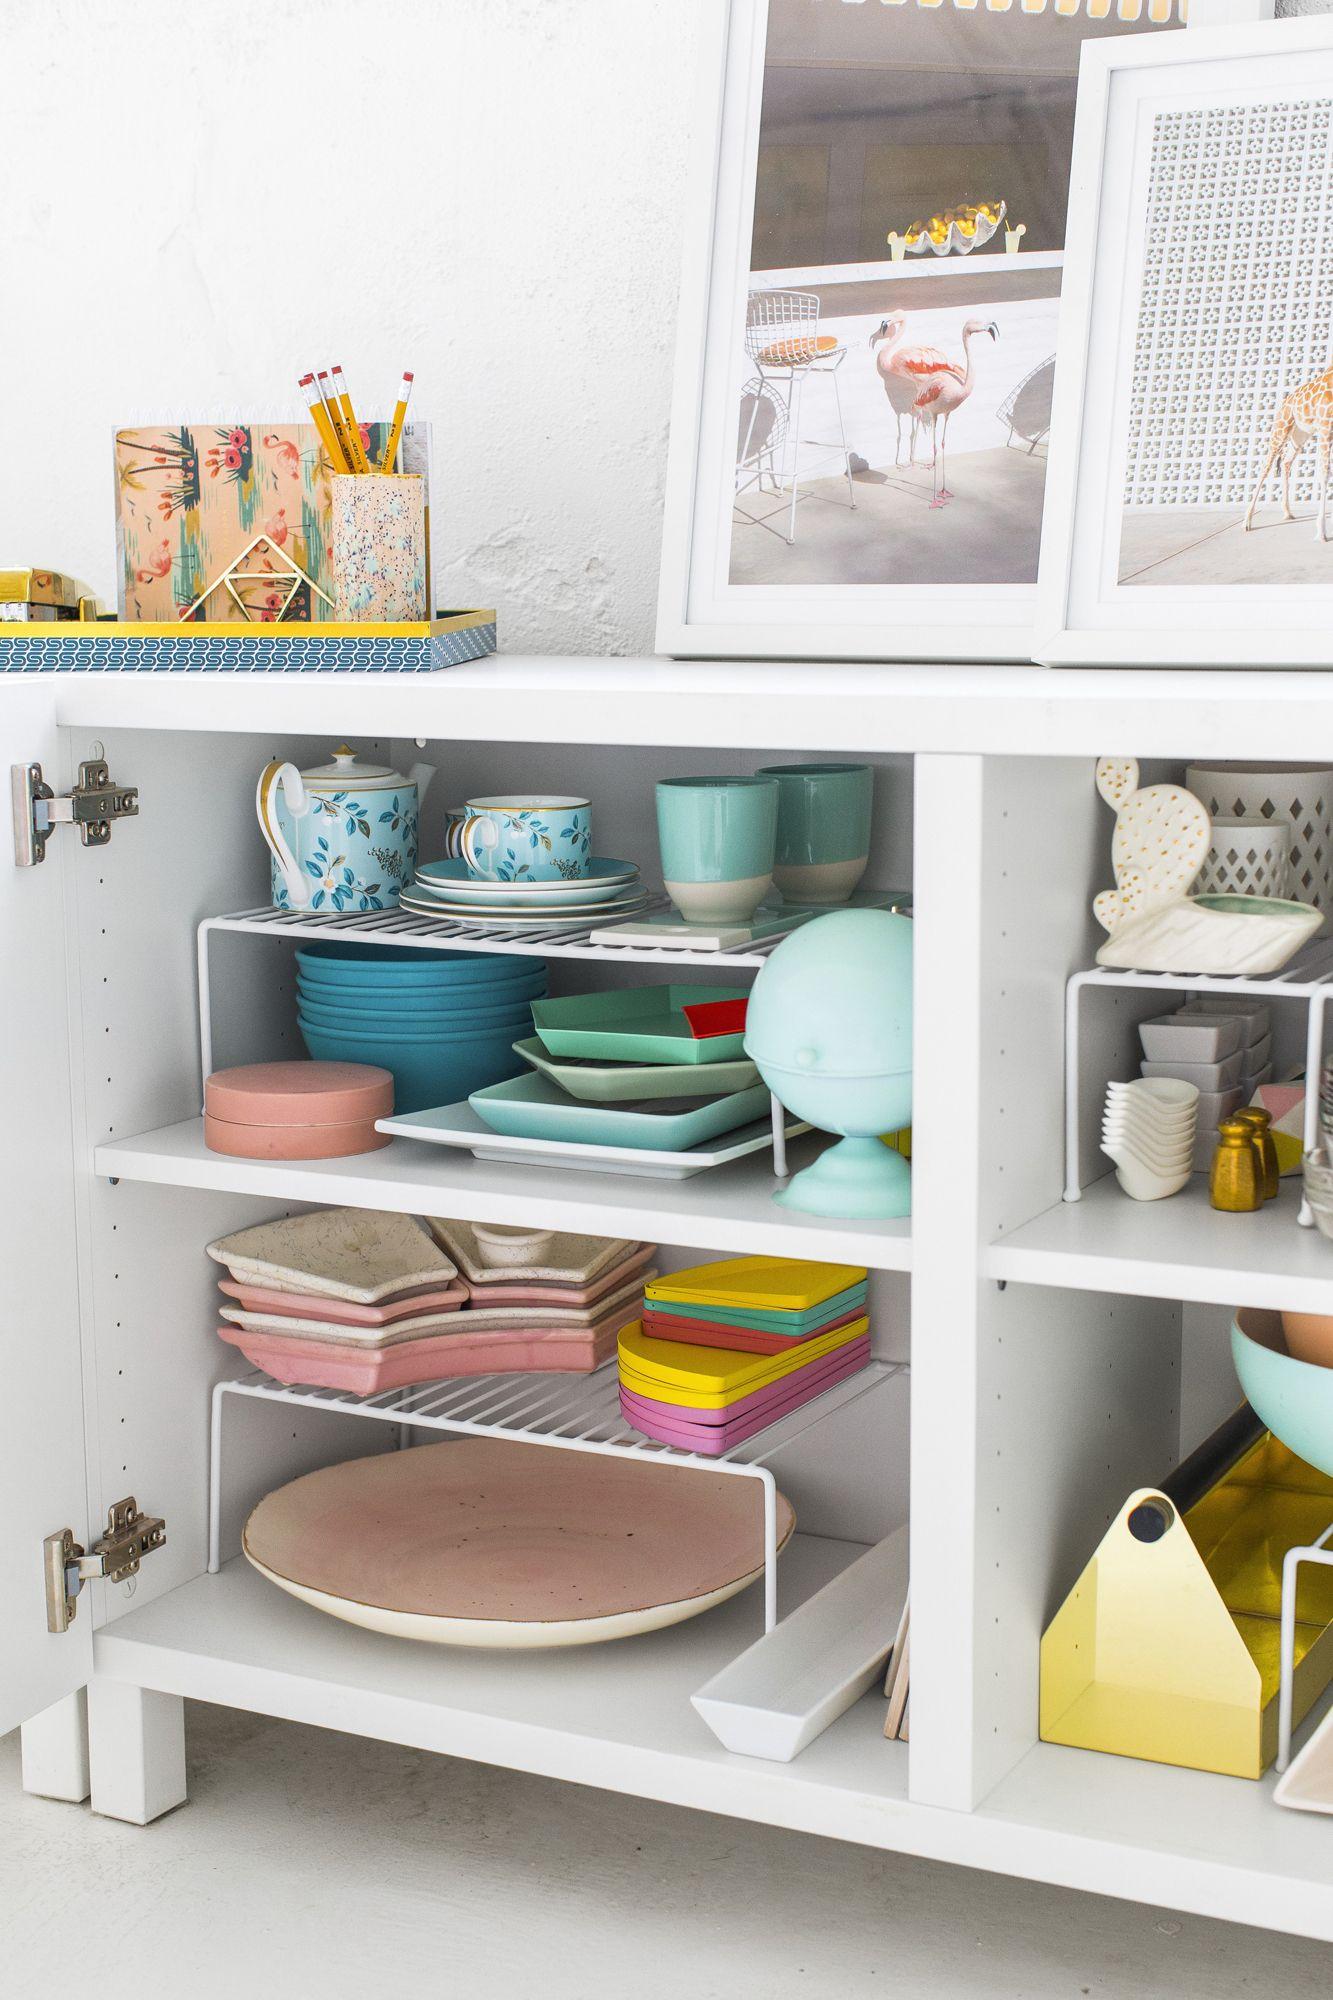 20 kitchen organization ideas kitchen organizing tips and tricks rh goodhousekeeping com